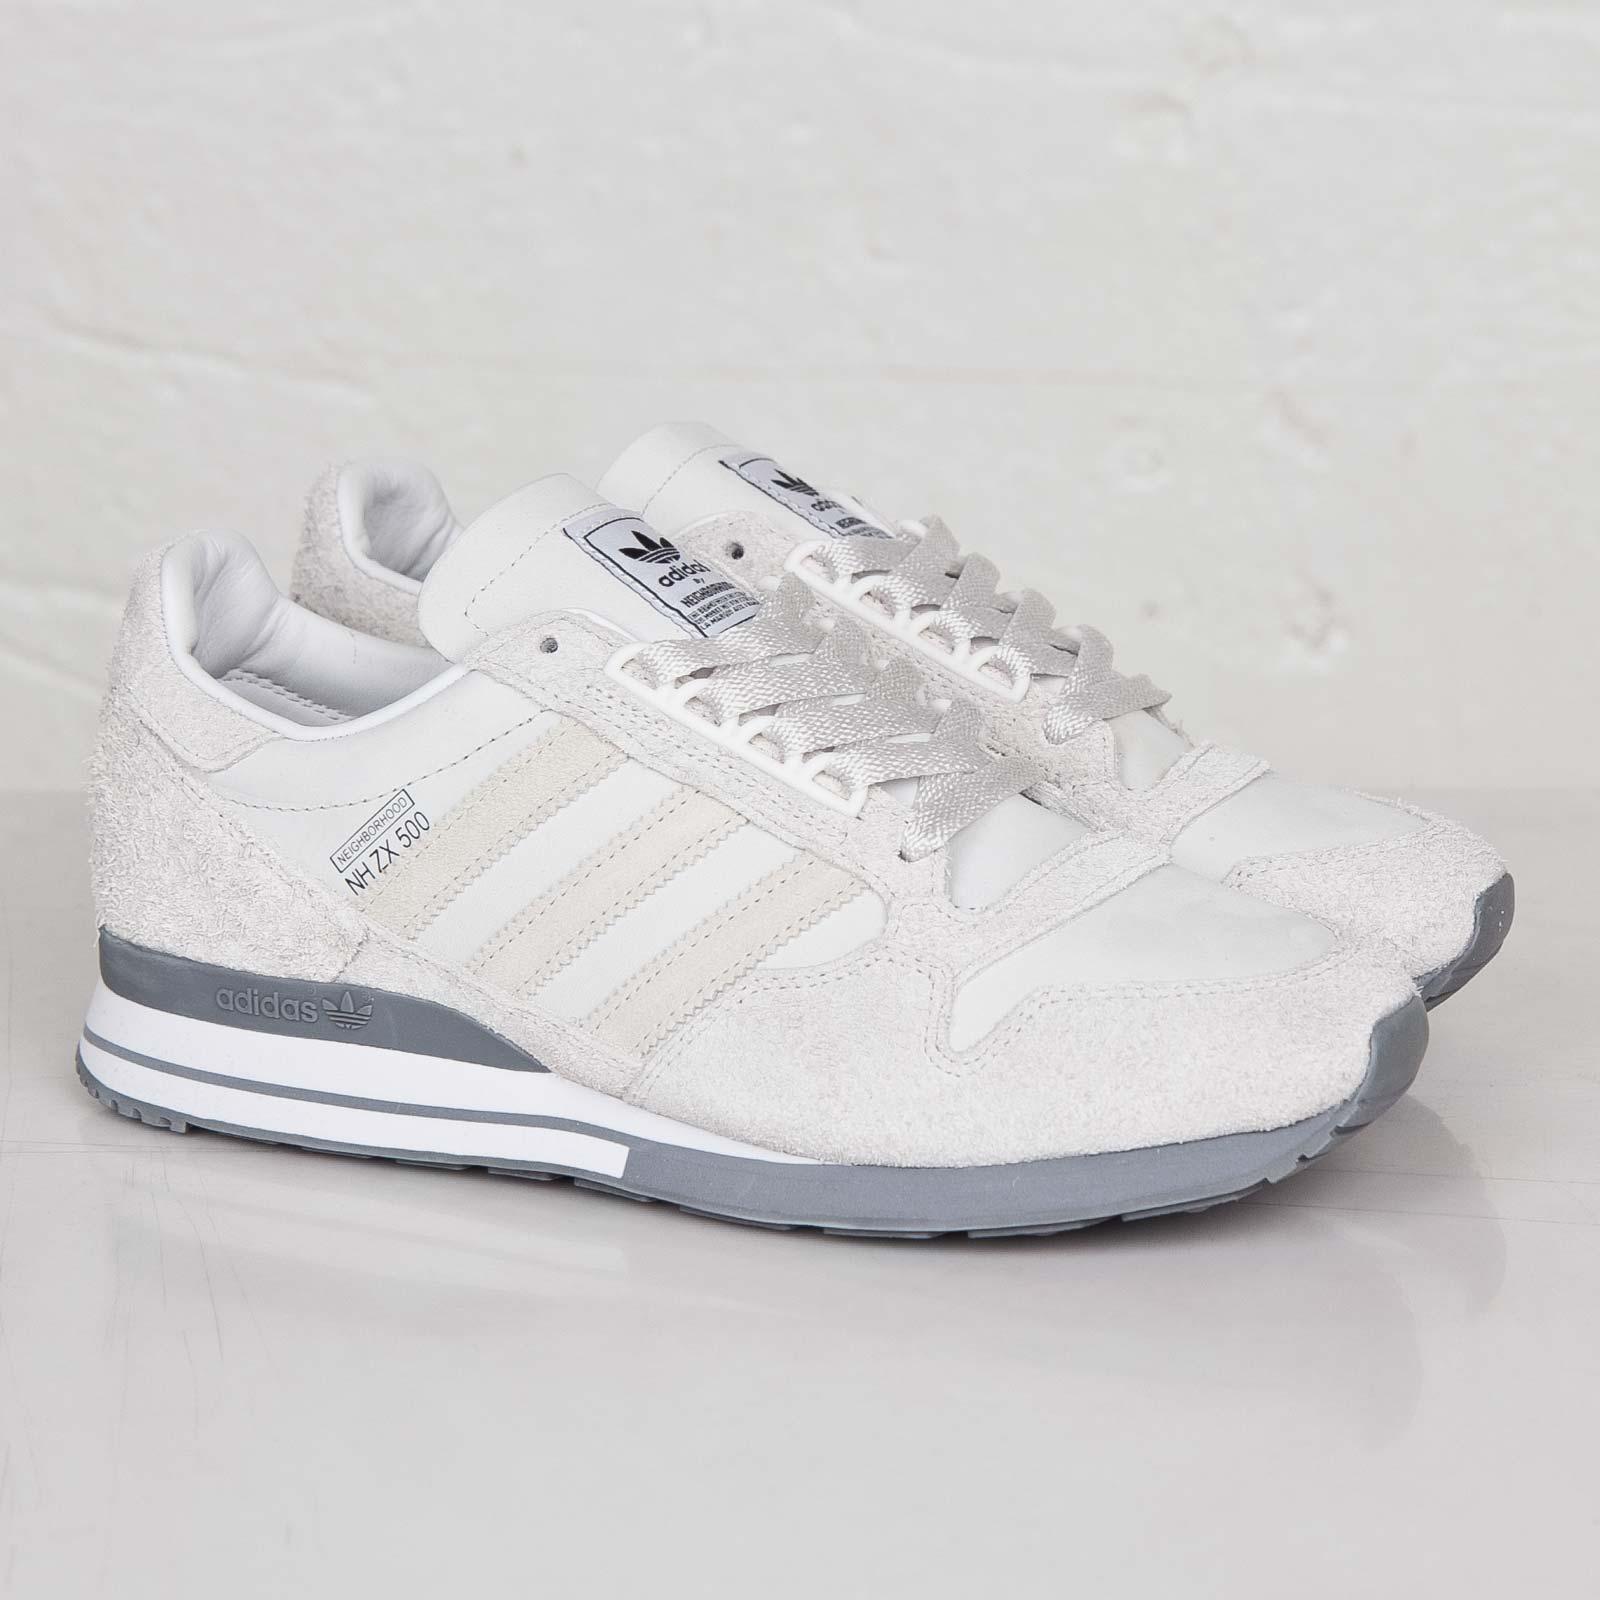 adidas NH ZX 500 OG B26088 Sneakersnstuff I Sneakers